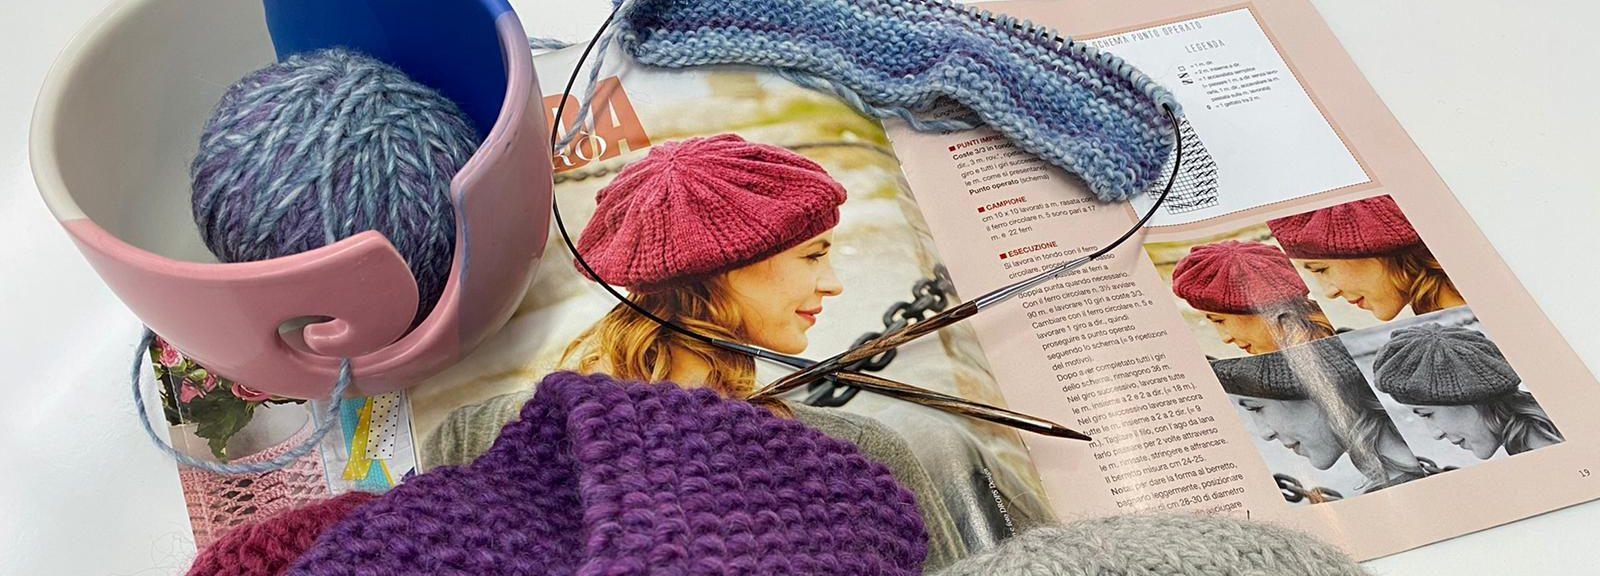 corso di knitting a torino